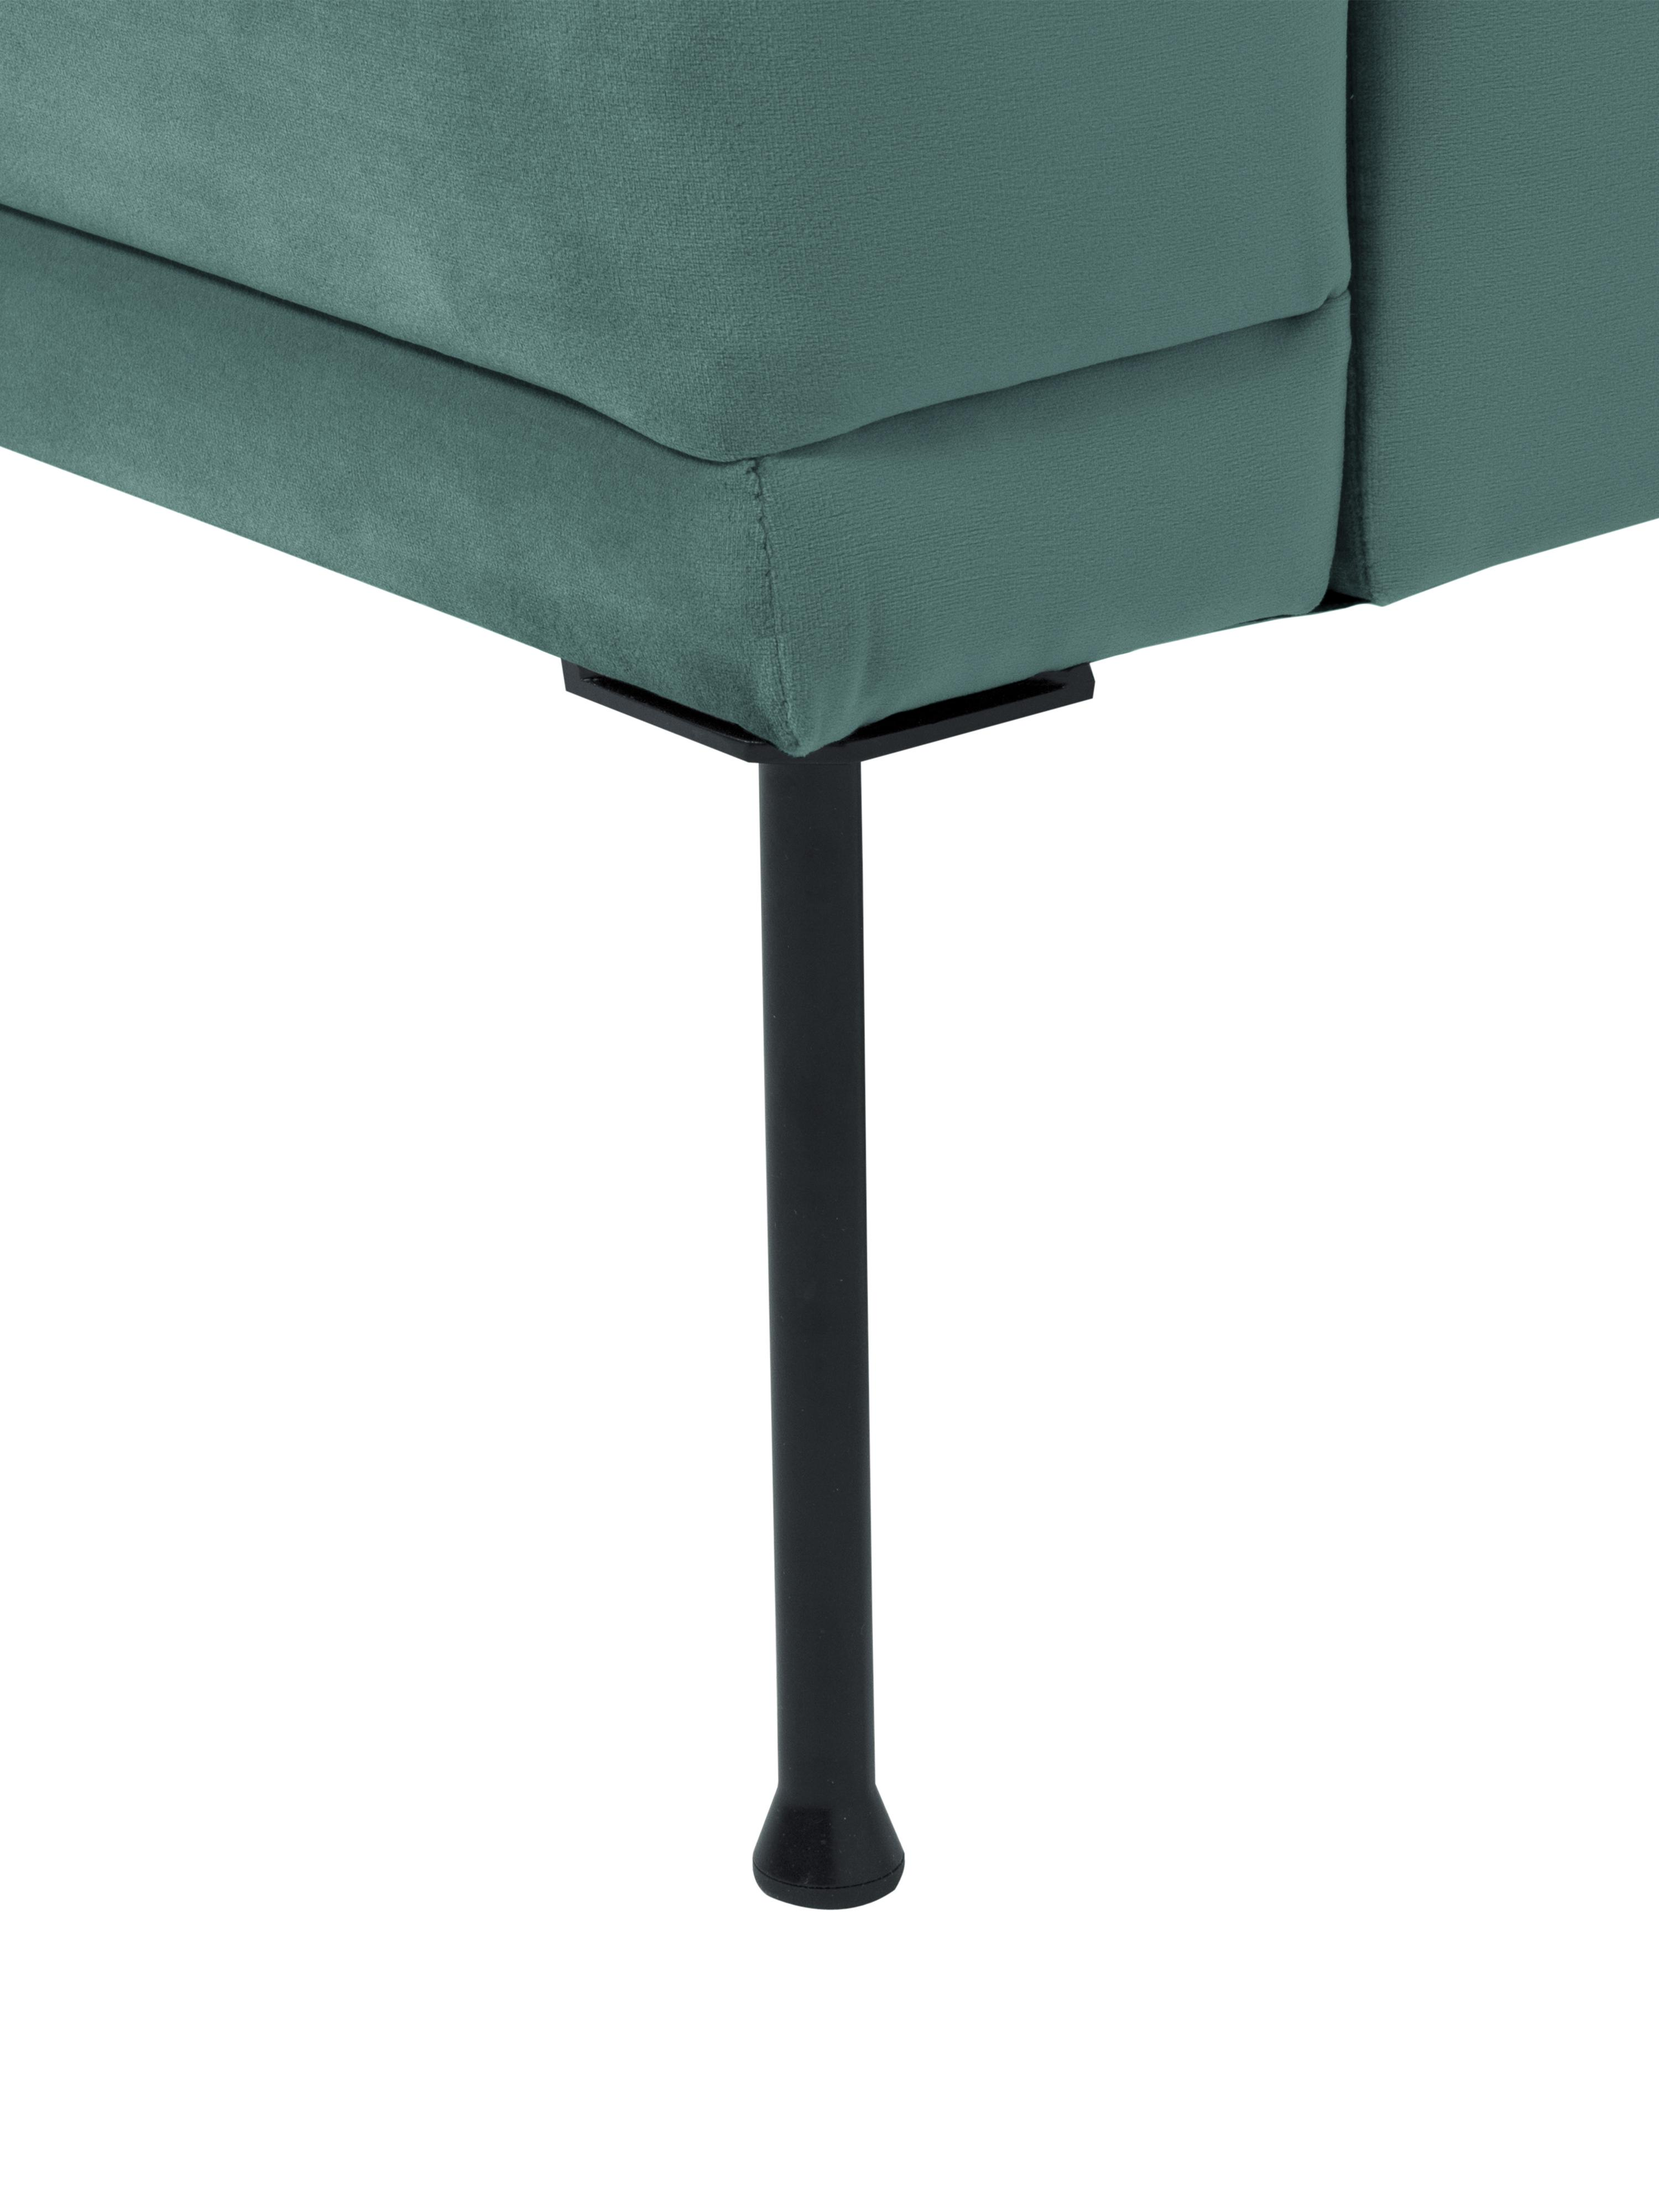 Samt-Sessel Fluente, Bezug: Samt (Hochwertiger Polyes, Gestell: Massives Kiefernholz, Füße: Metall, pulverbeschichtet, Samt Hellgrün, B 74 x T 85 cm